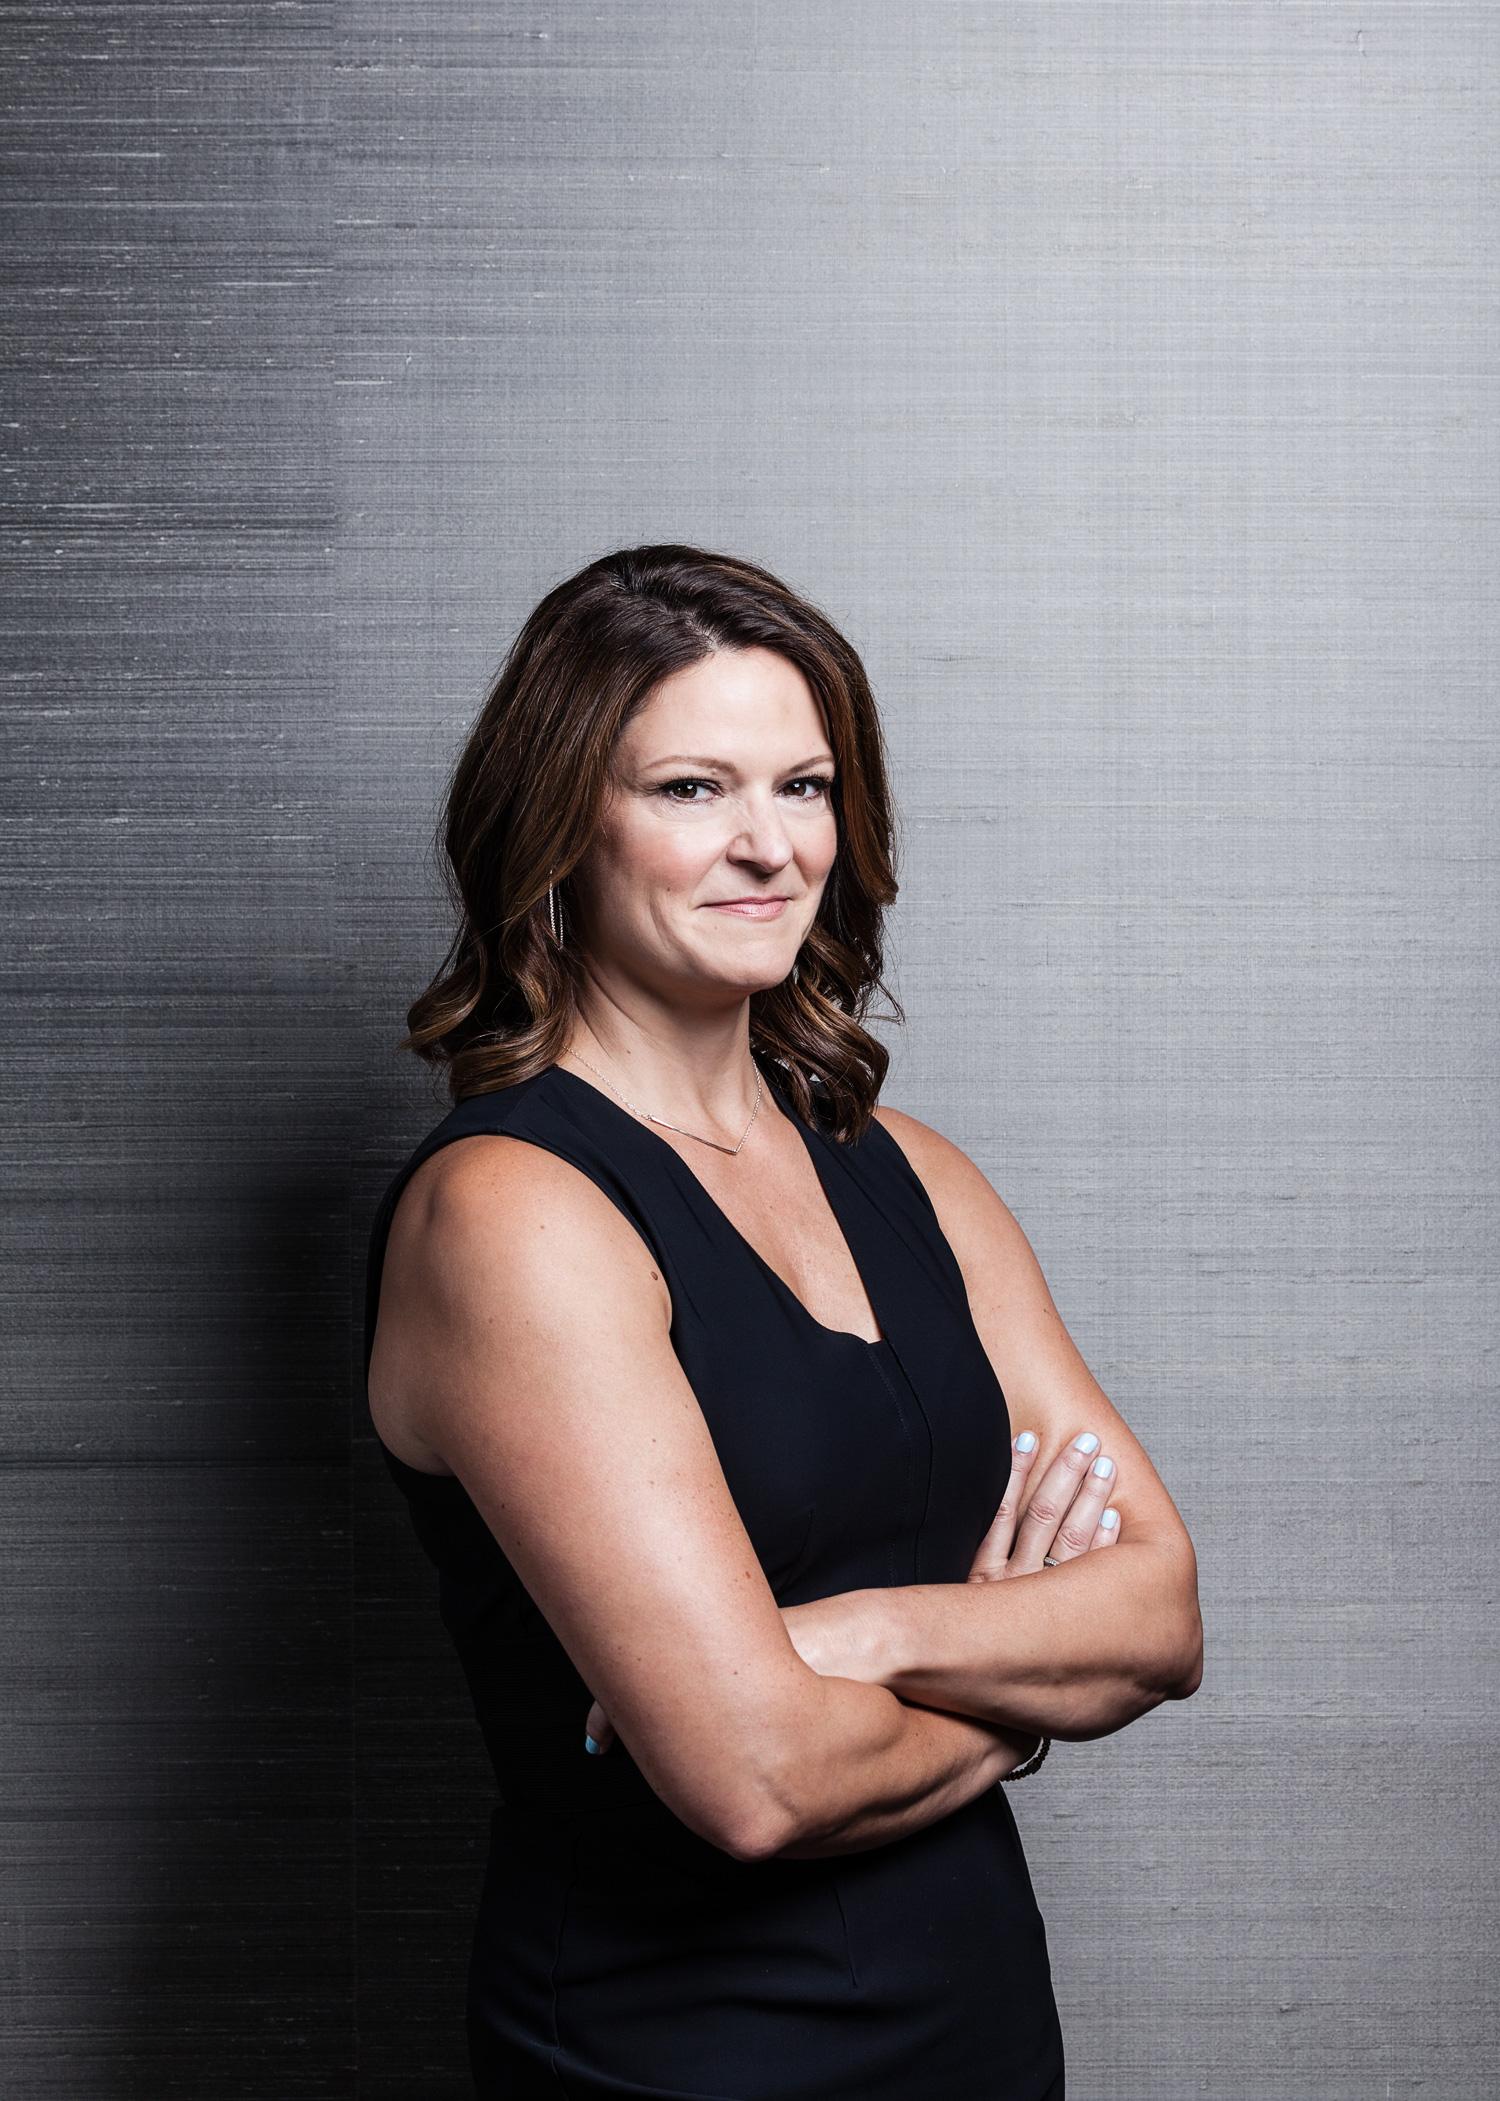 Jennifer Ellison, CFA & Principal at Bingham Osborn & Scarborough / Financial Planning | SourceMedia